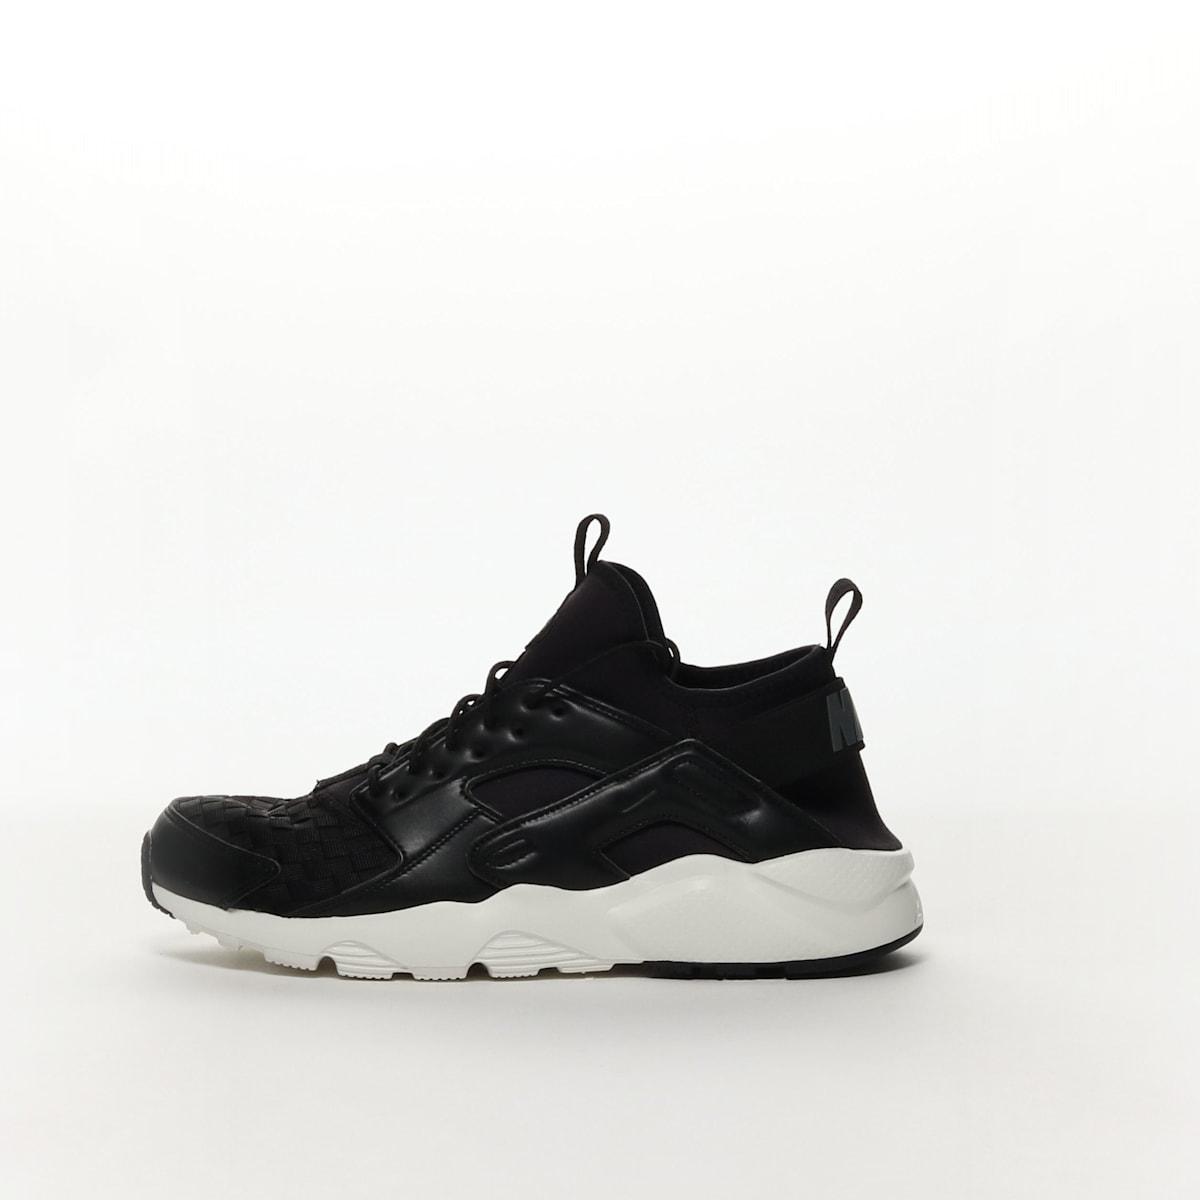 5102d57a61e74 Men s Nike Air Huarache Run Ultra SE Shoe - BLACK DARK GREY-SAIL ...